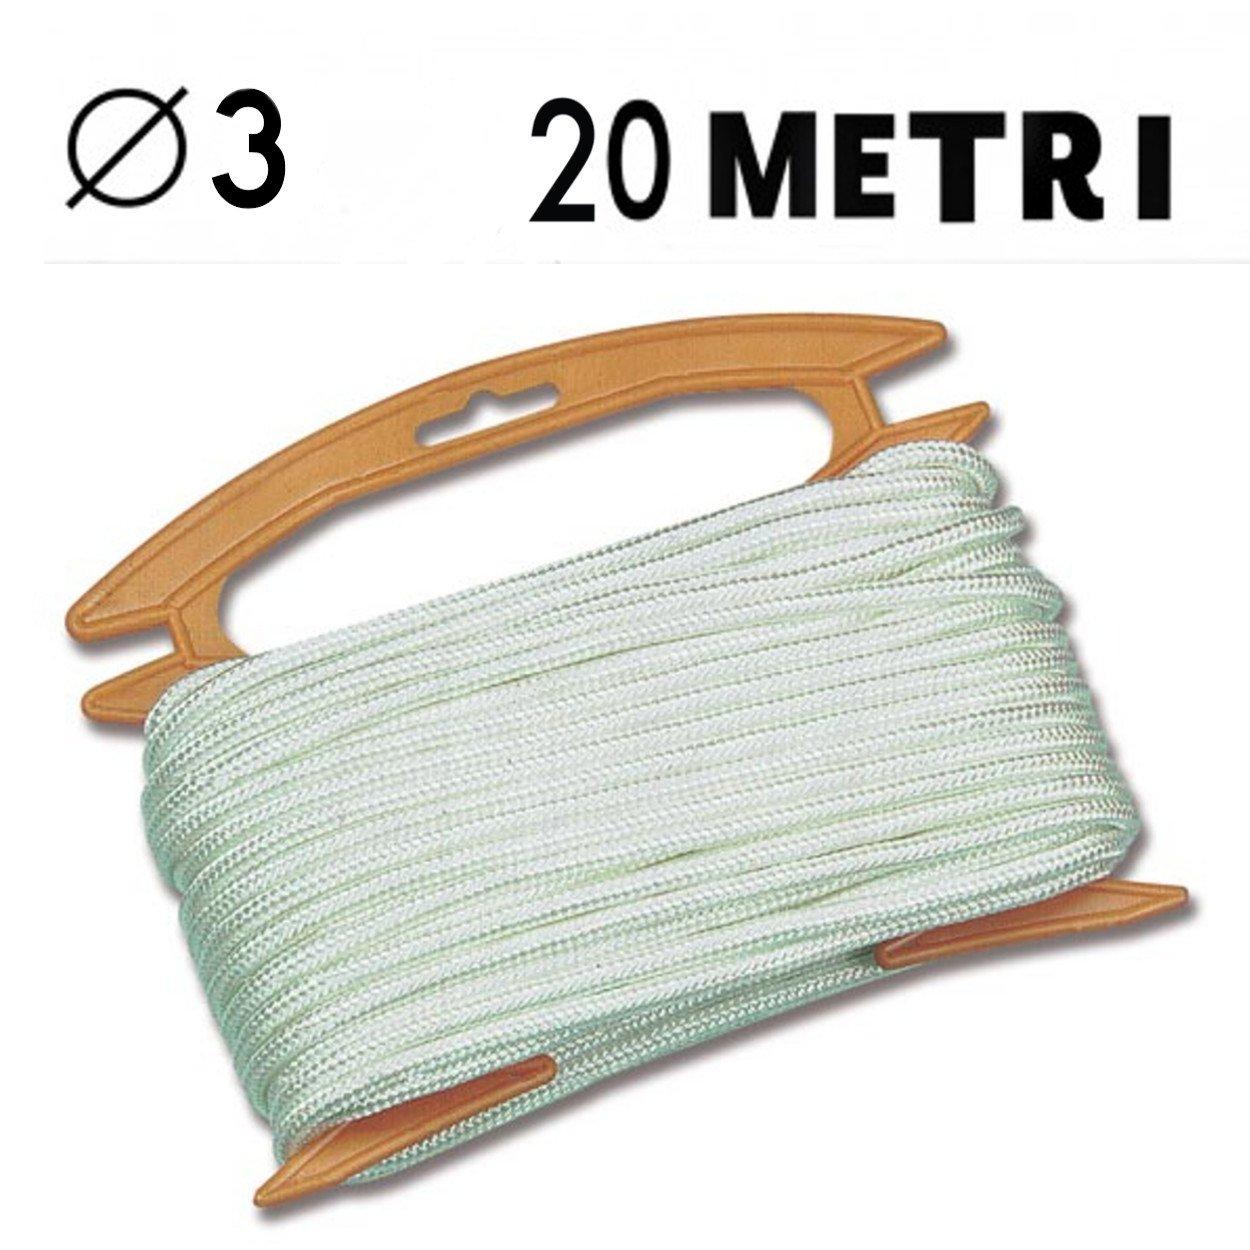 Corda elastica bianca confezione self service in bobina da 20 metri diametro corda 3 mm nautica (078